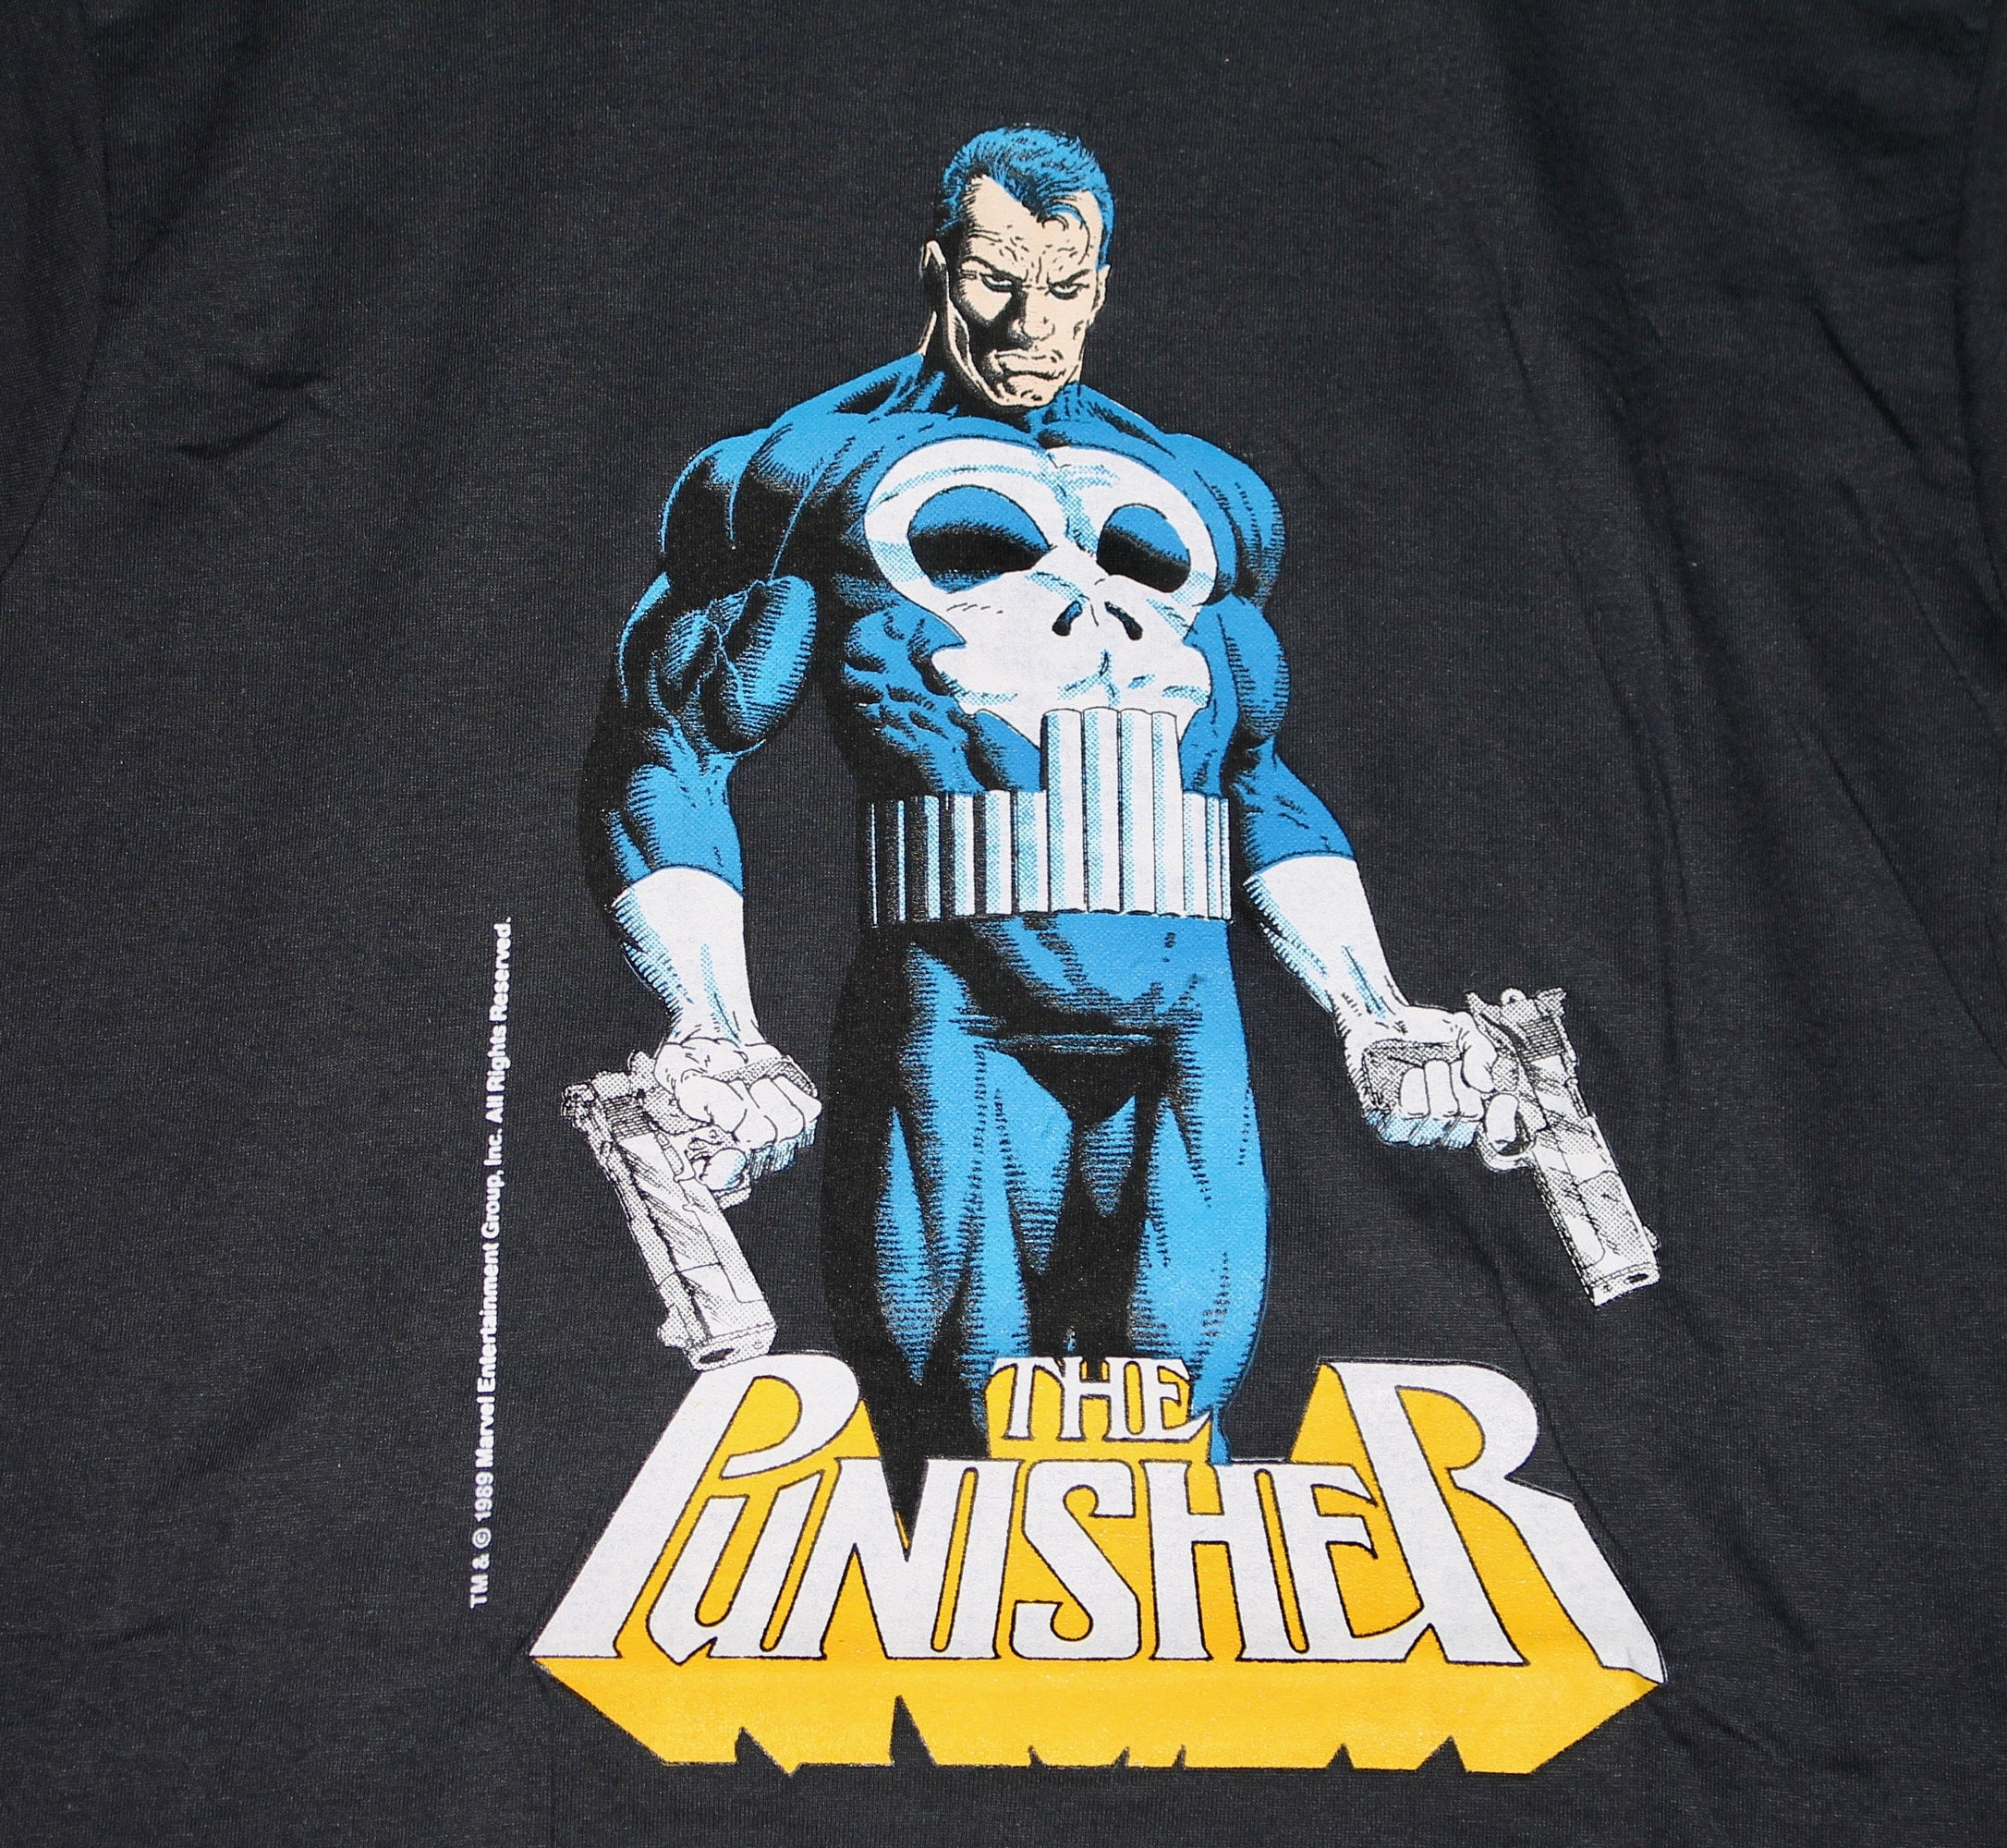 S/M * NOS thin vtg 80s 1989 The Punisher Marvel Comic screen